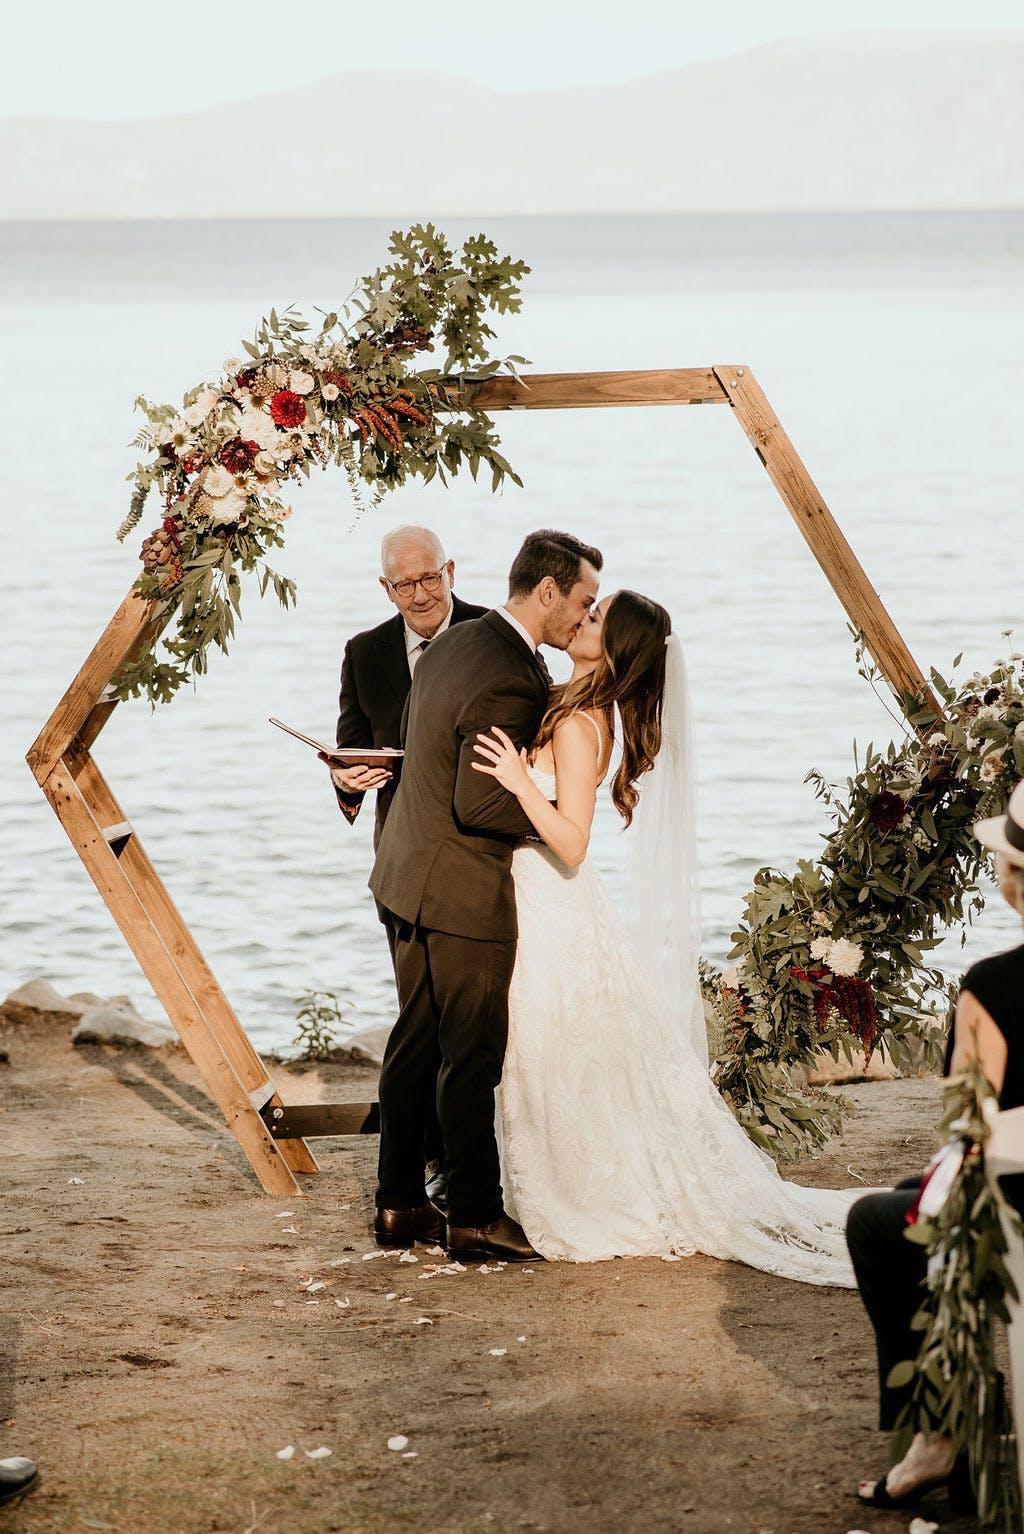 Boho Chic Wedding at Hellman-Ehrman Mansion in Lake Tahoe, CA